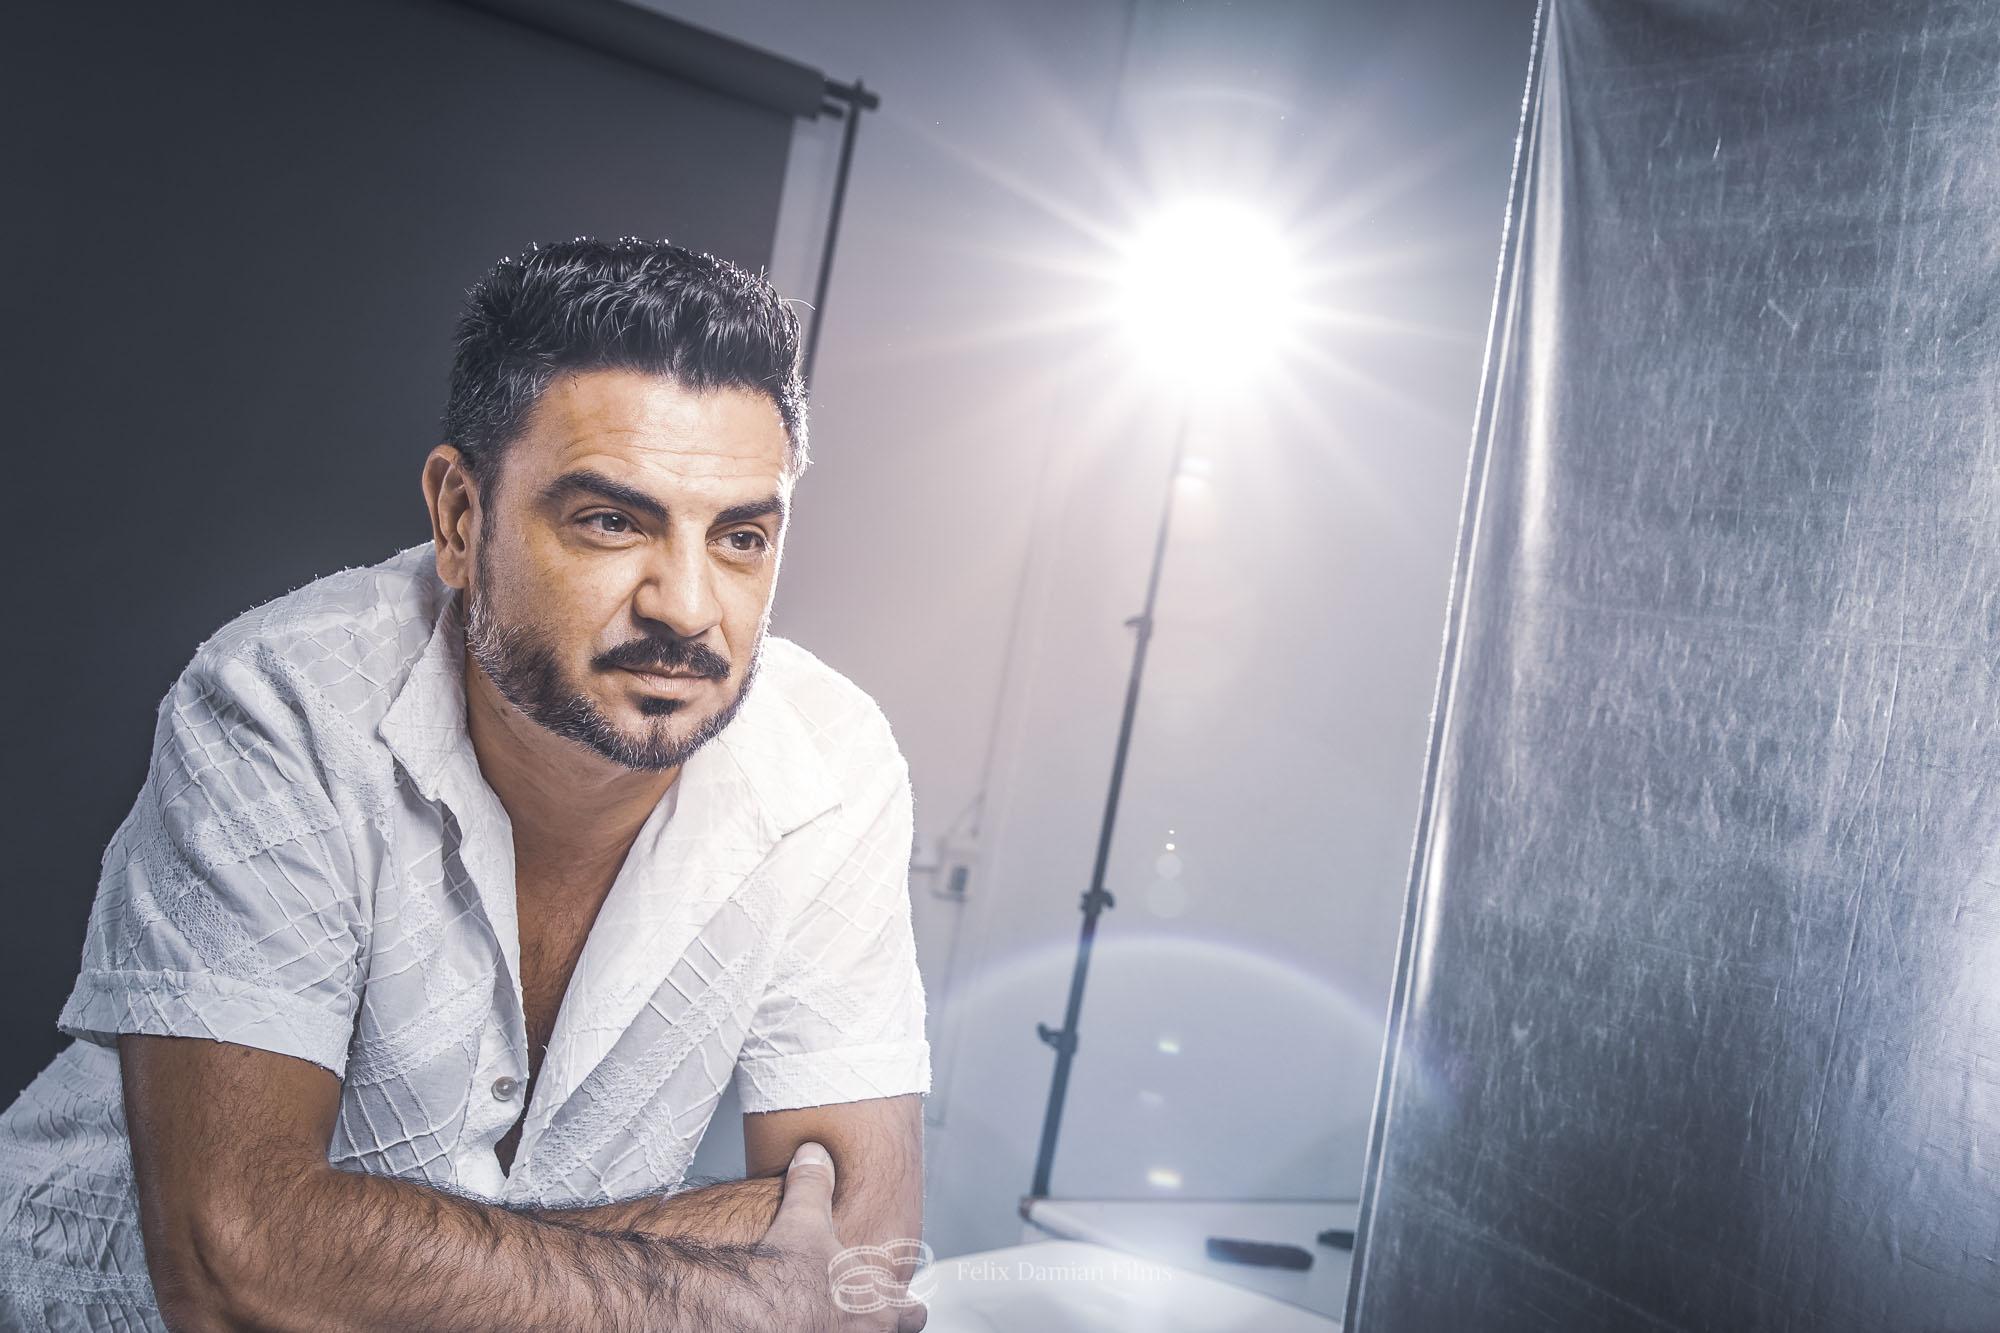 fotografo de retratos corporativos flash